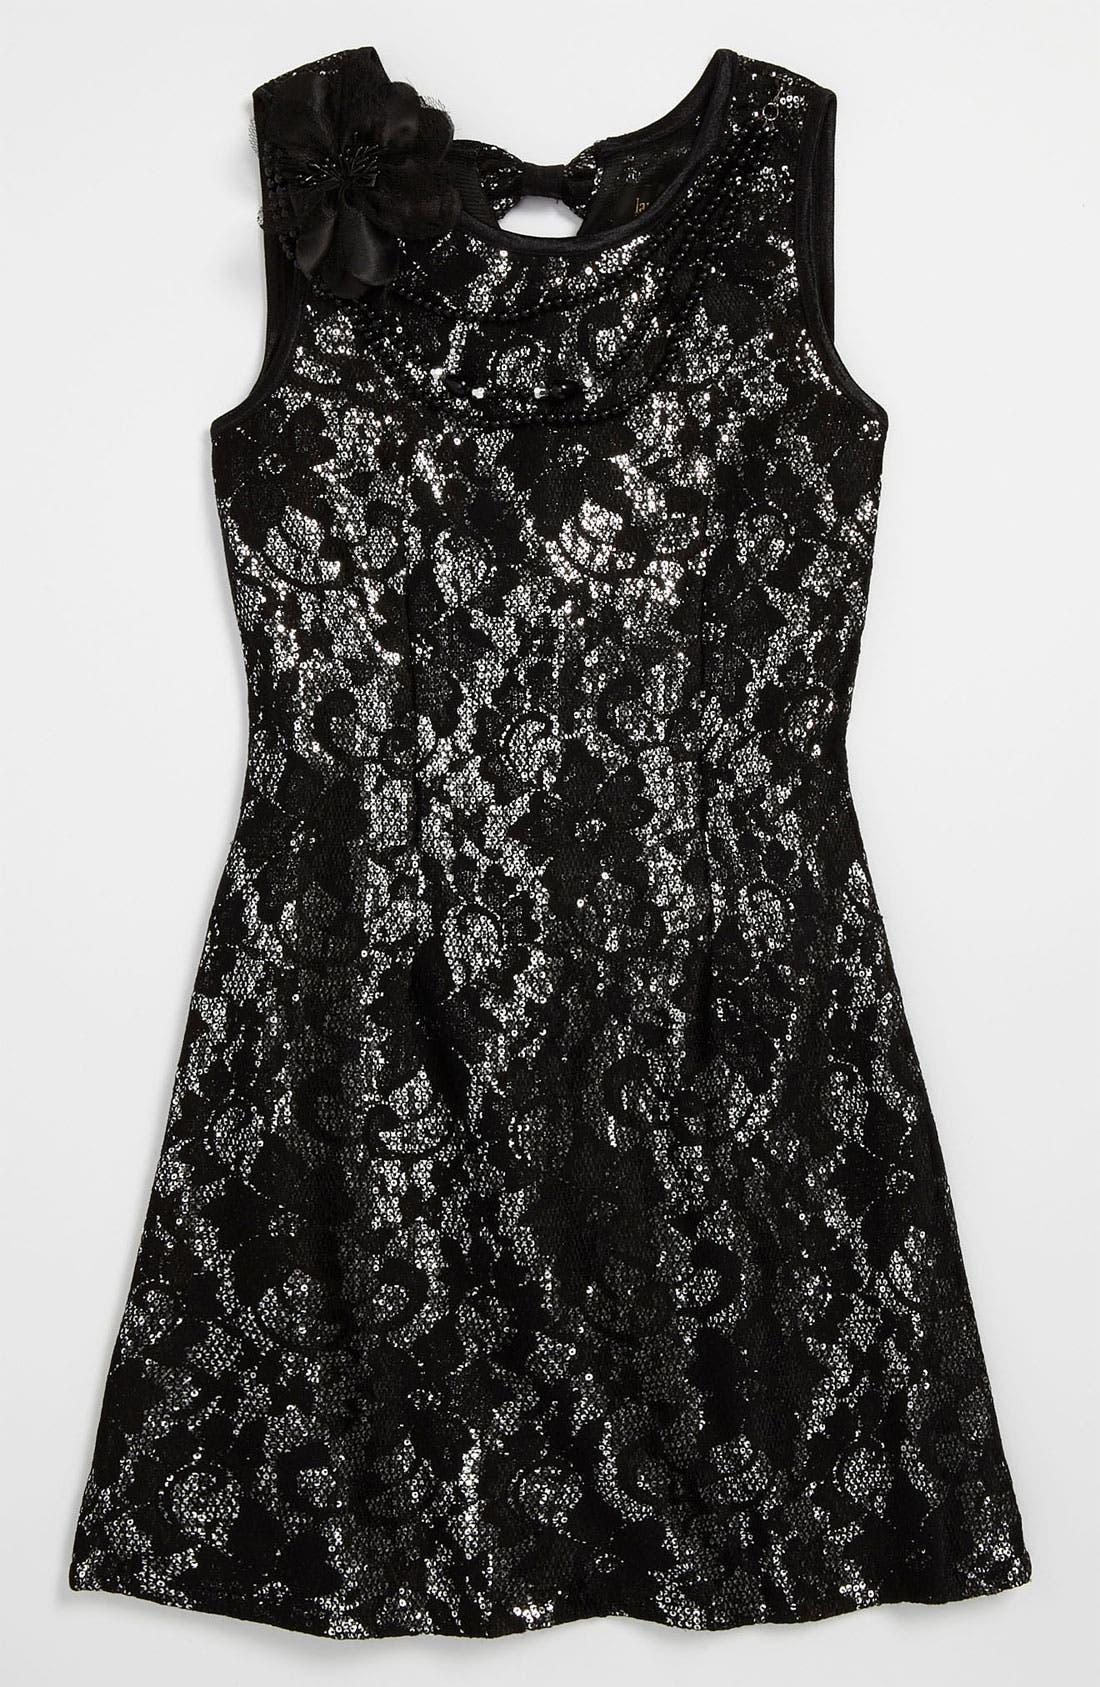 Main Image - Laundry by Shelli Segal 'Jessica' Dress (Big Girls)